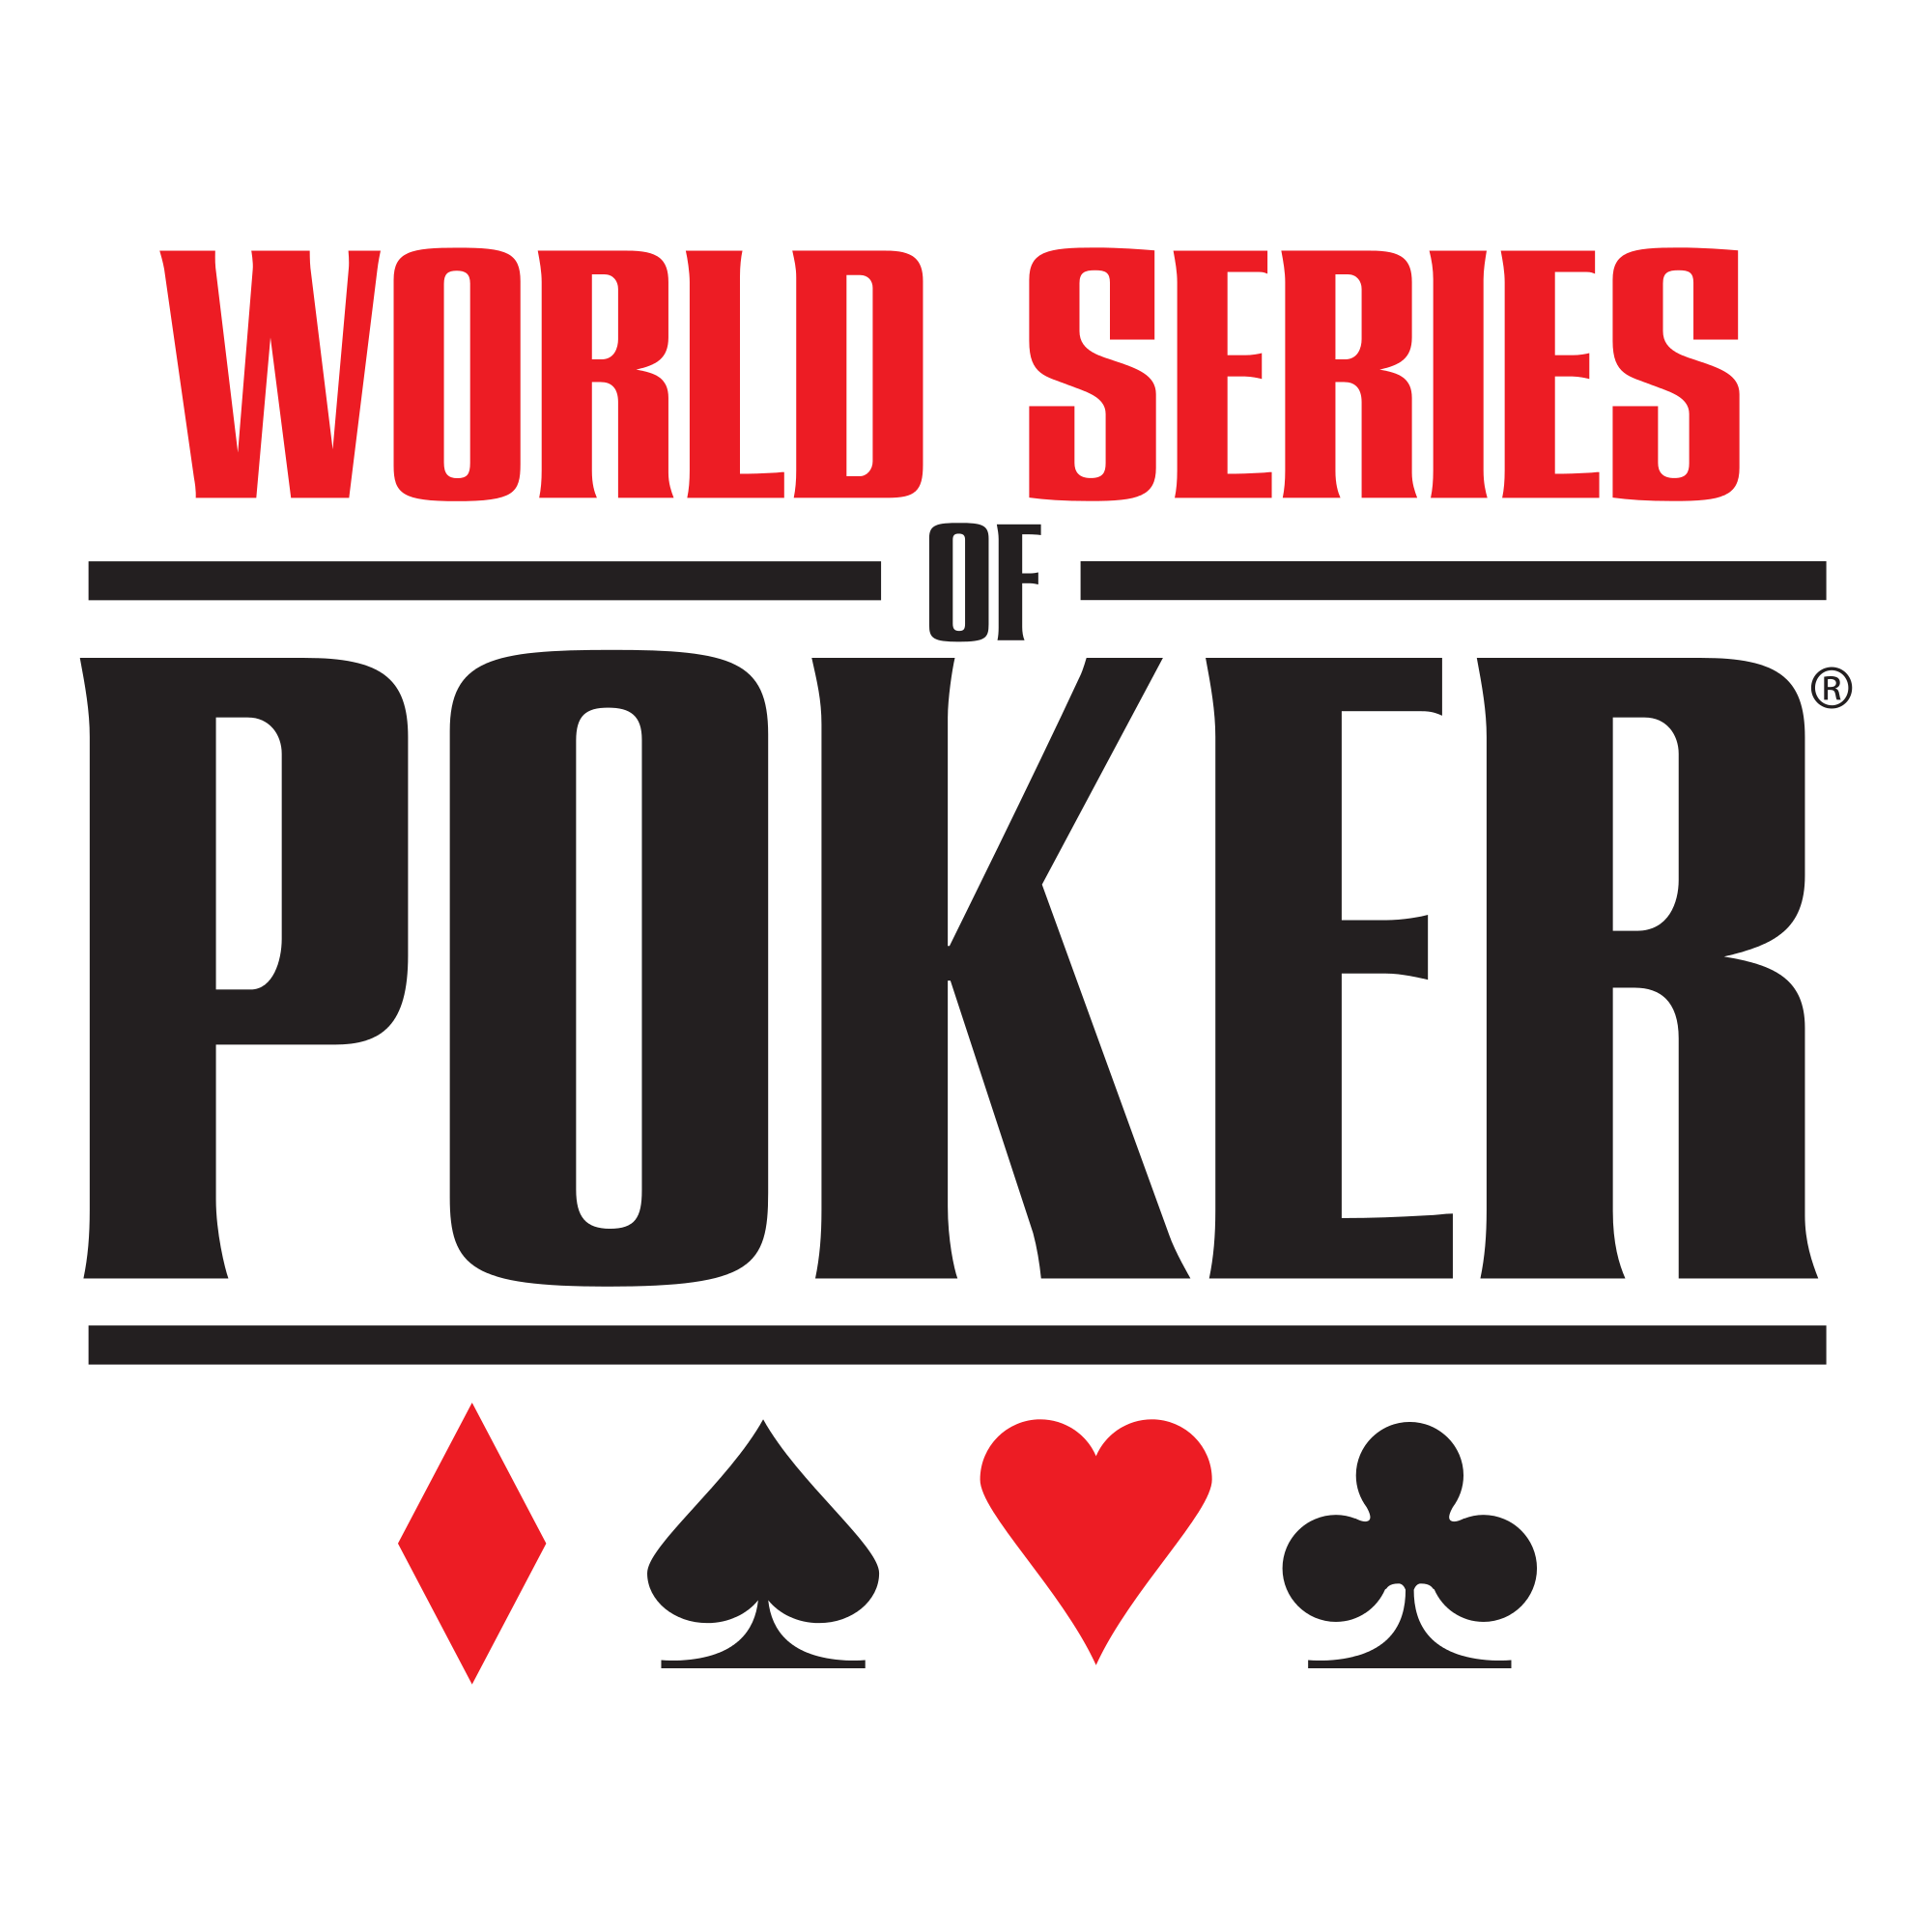 Betlinee com co world series of poker - 25676